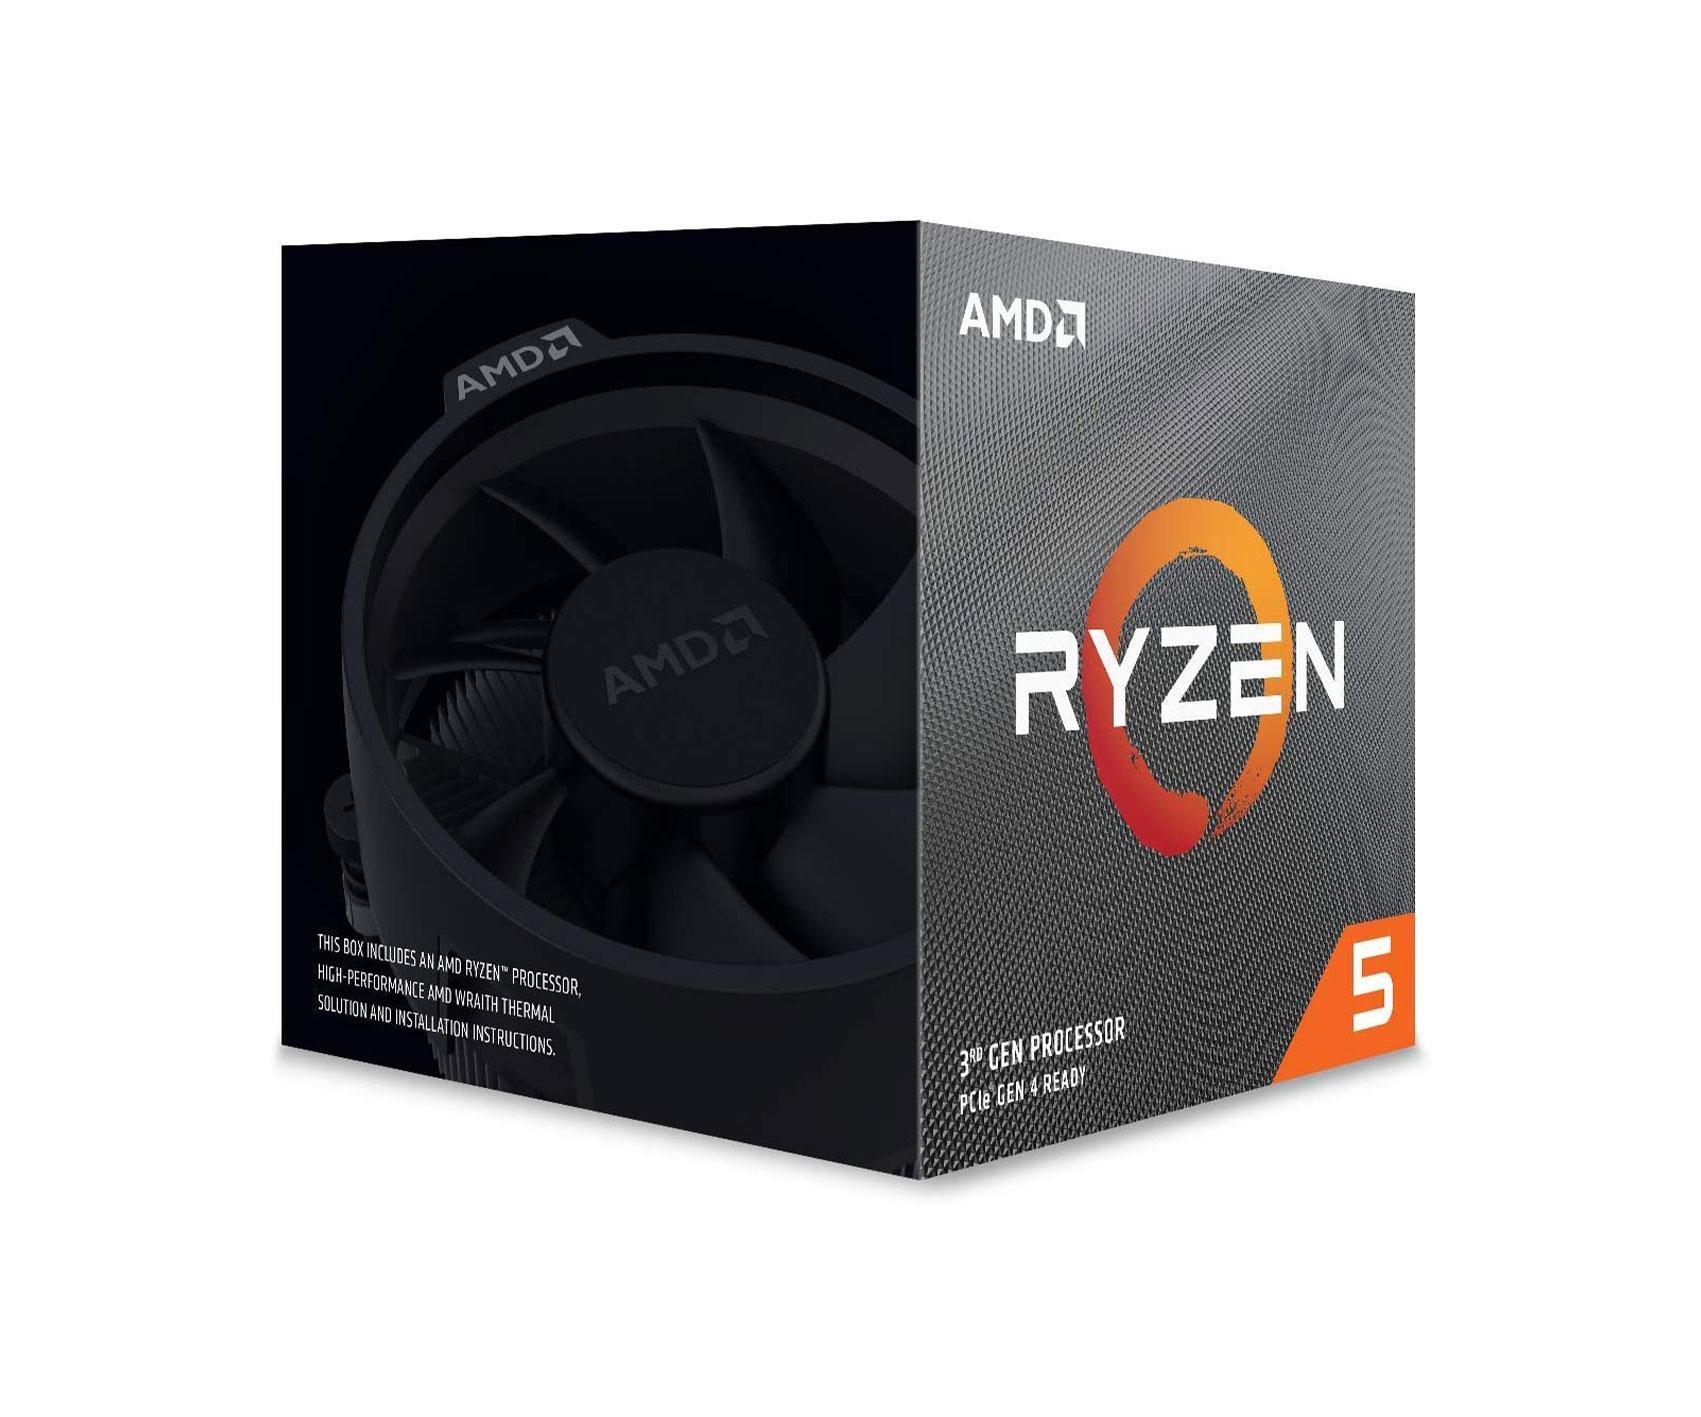 Ryzen 5 2600 Processor